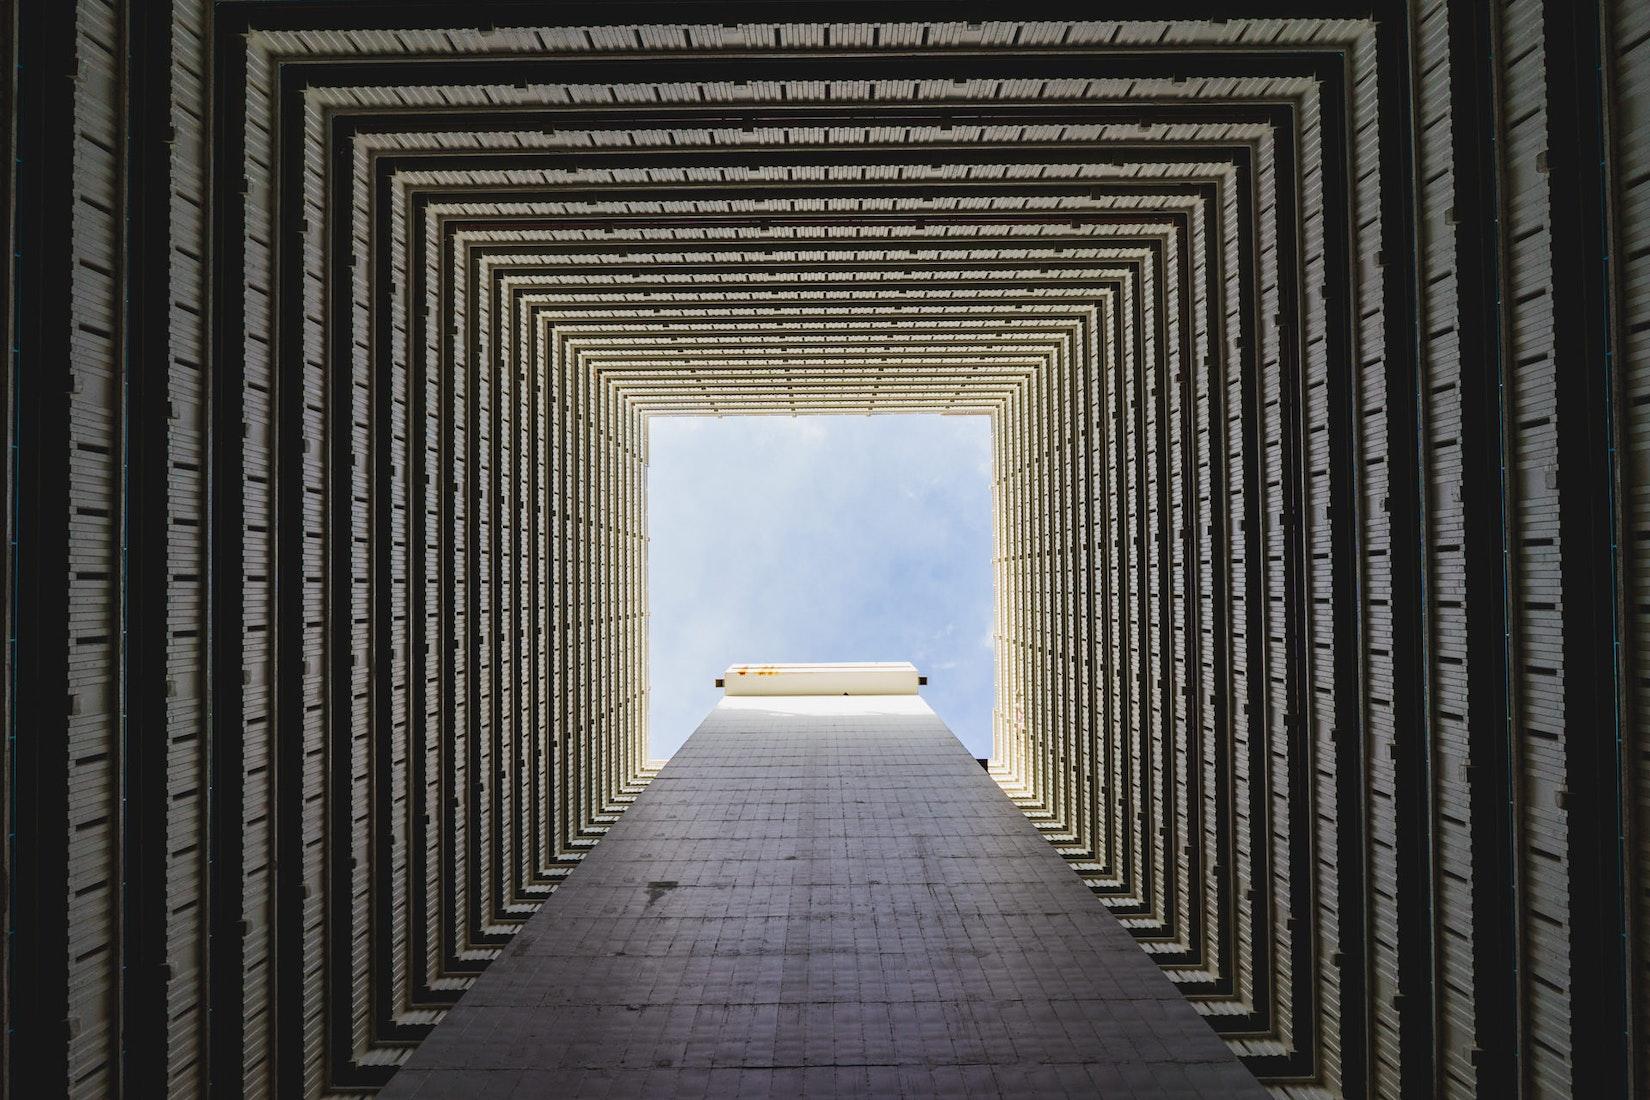 Hong Kong image from Ping Shek Estate